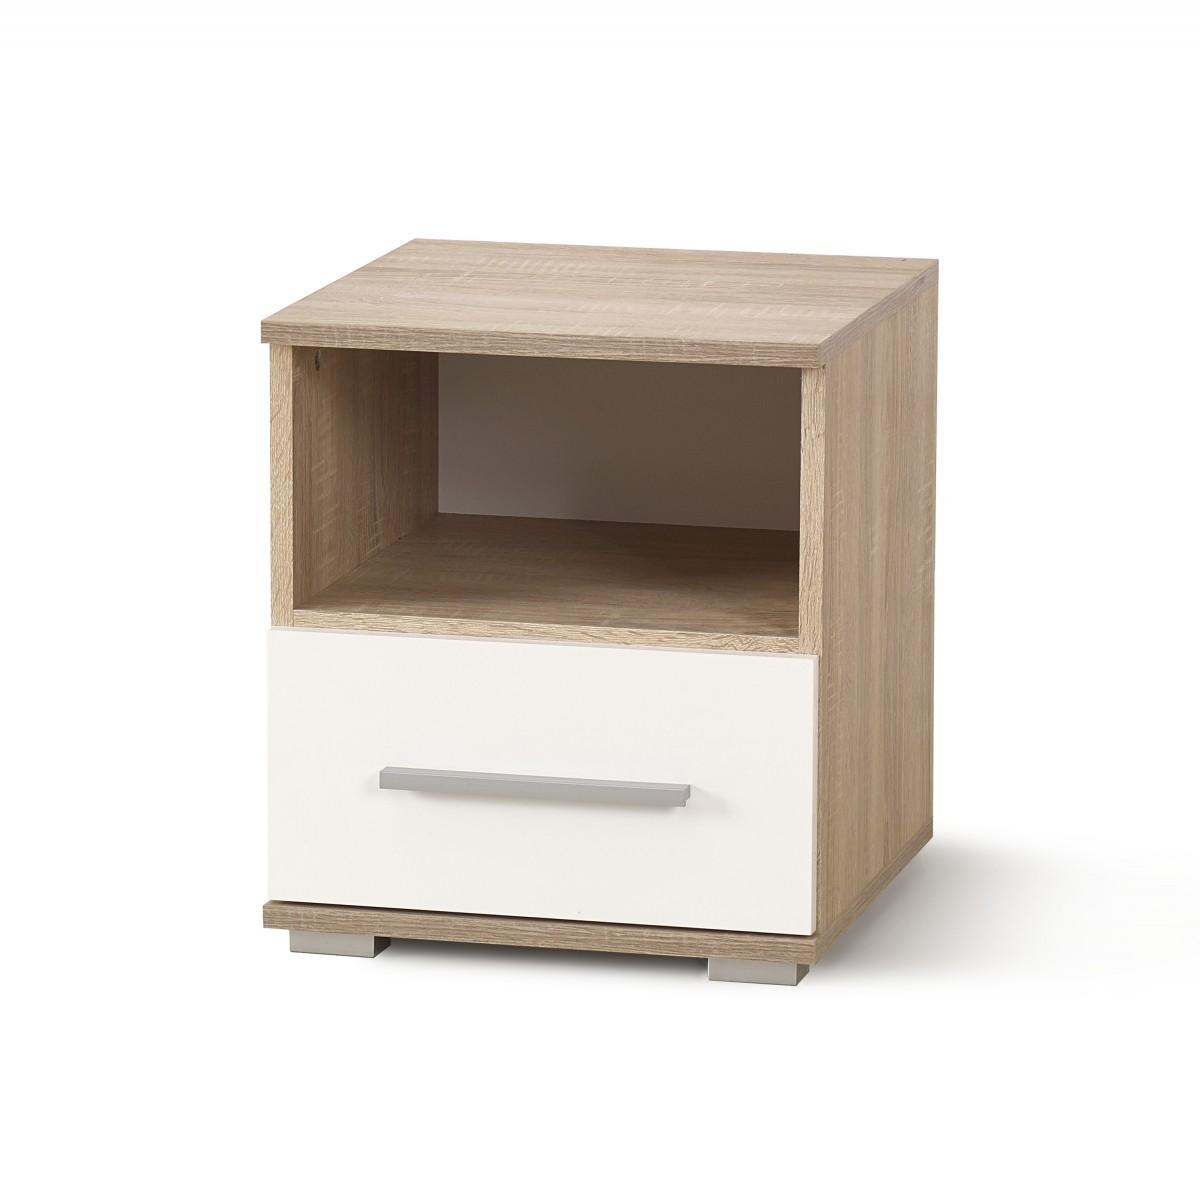 Noční stolek Mano dub sonoma/bílý